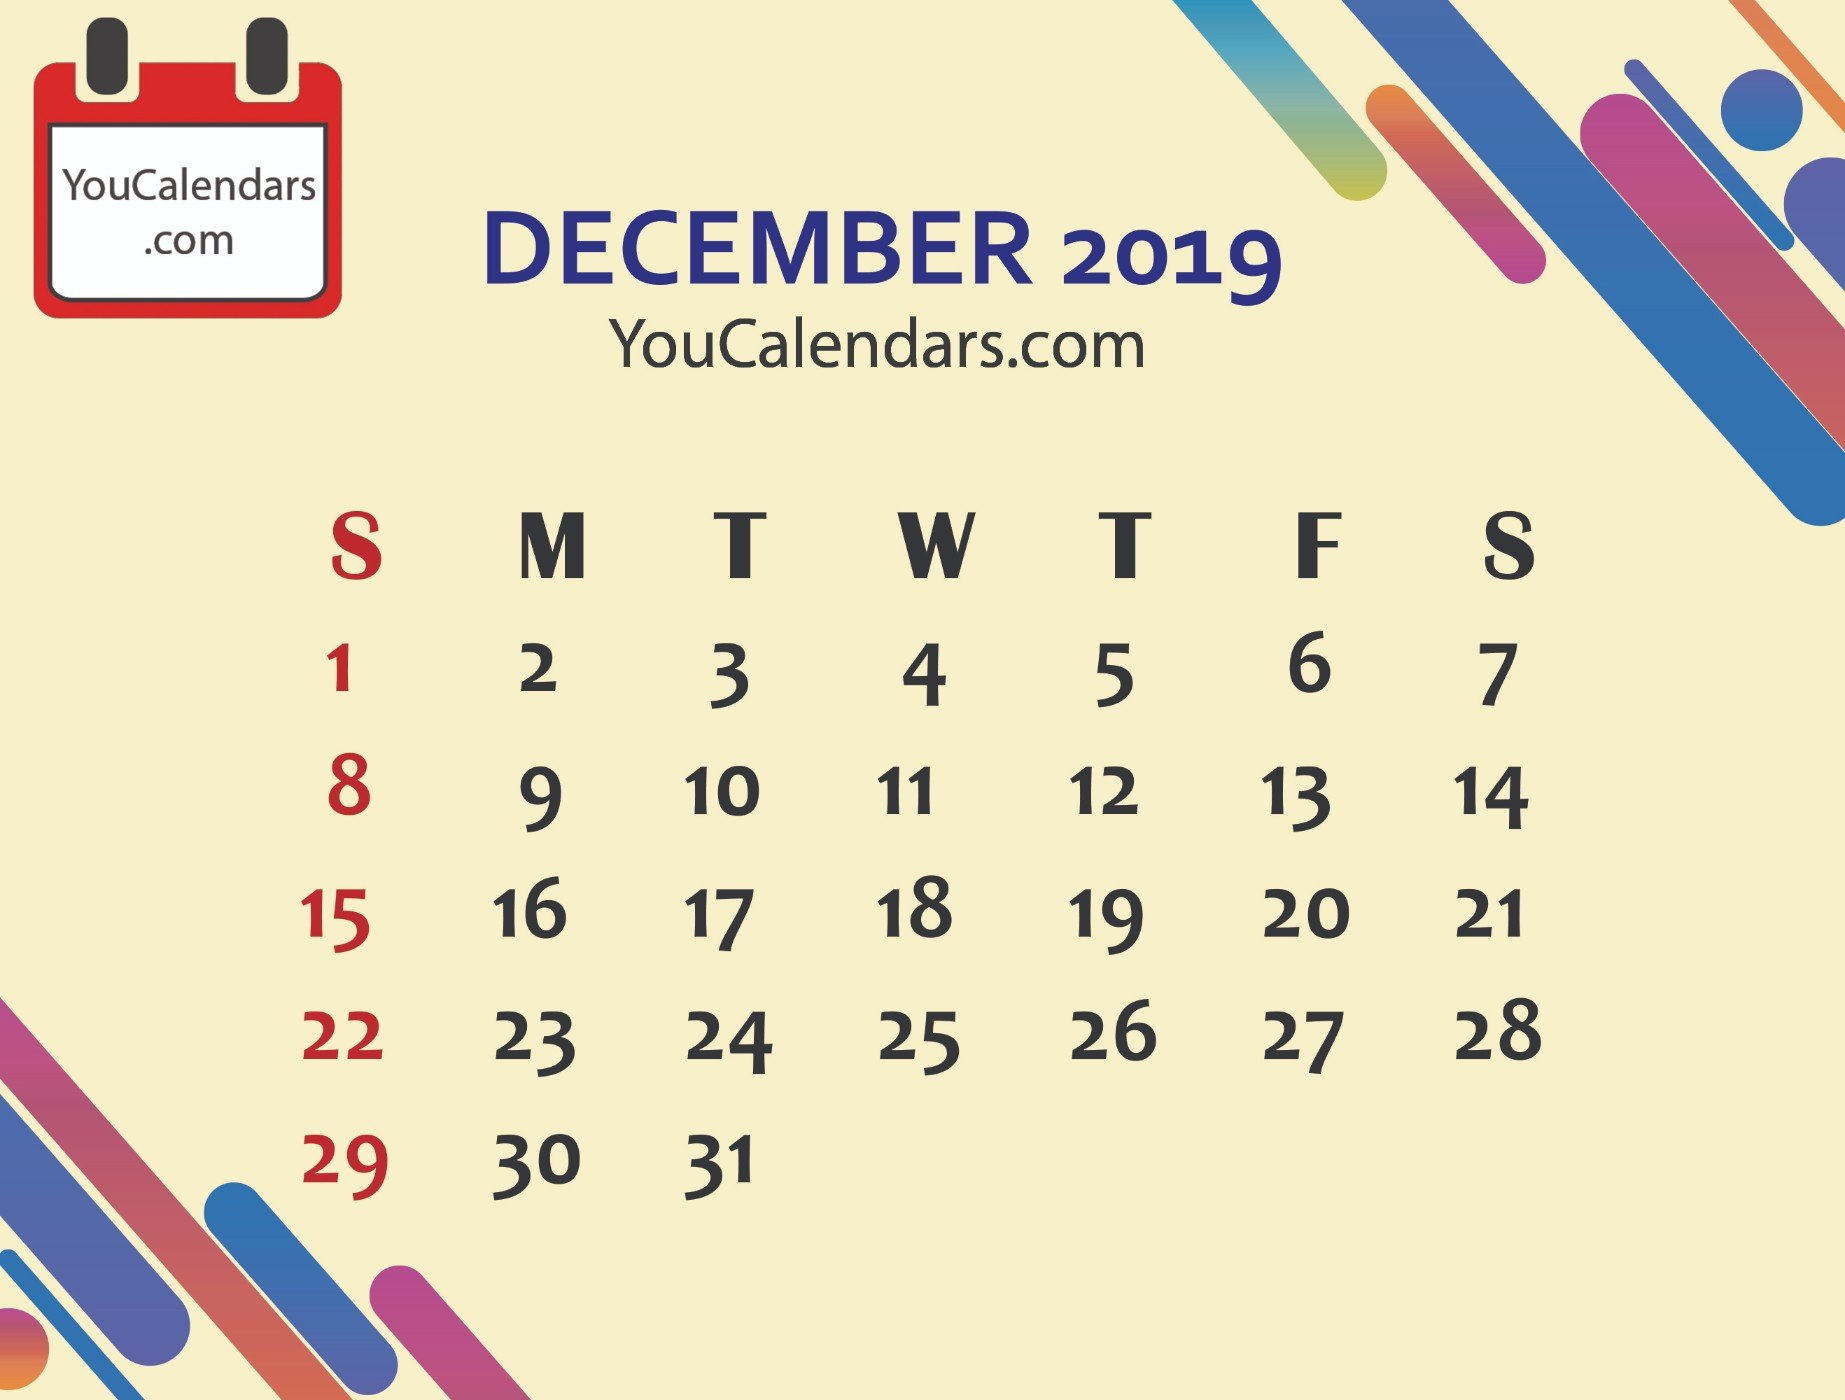 ✅Free December 2019 Calendar Printable Template – You Calendars U Of M Calendar 2019